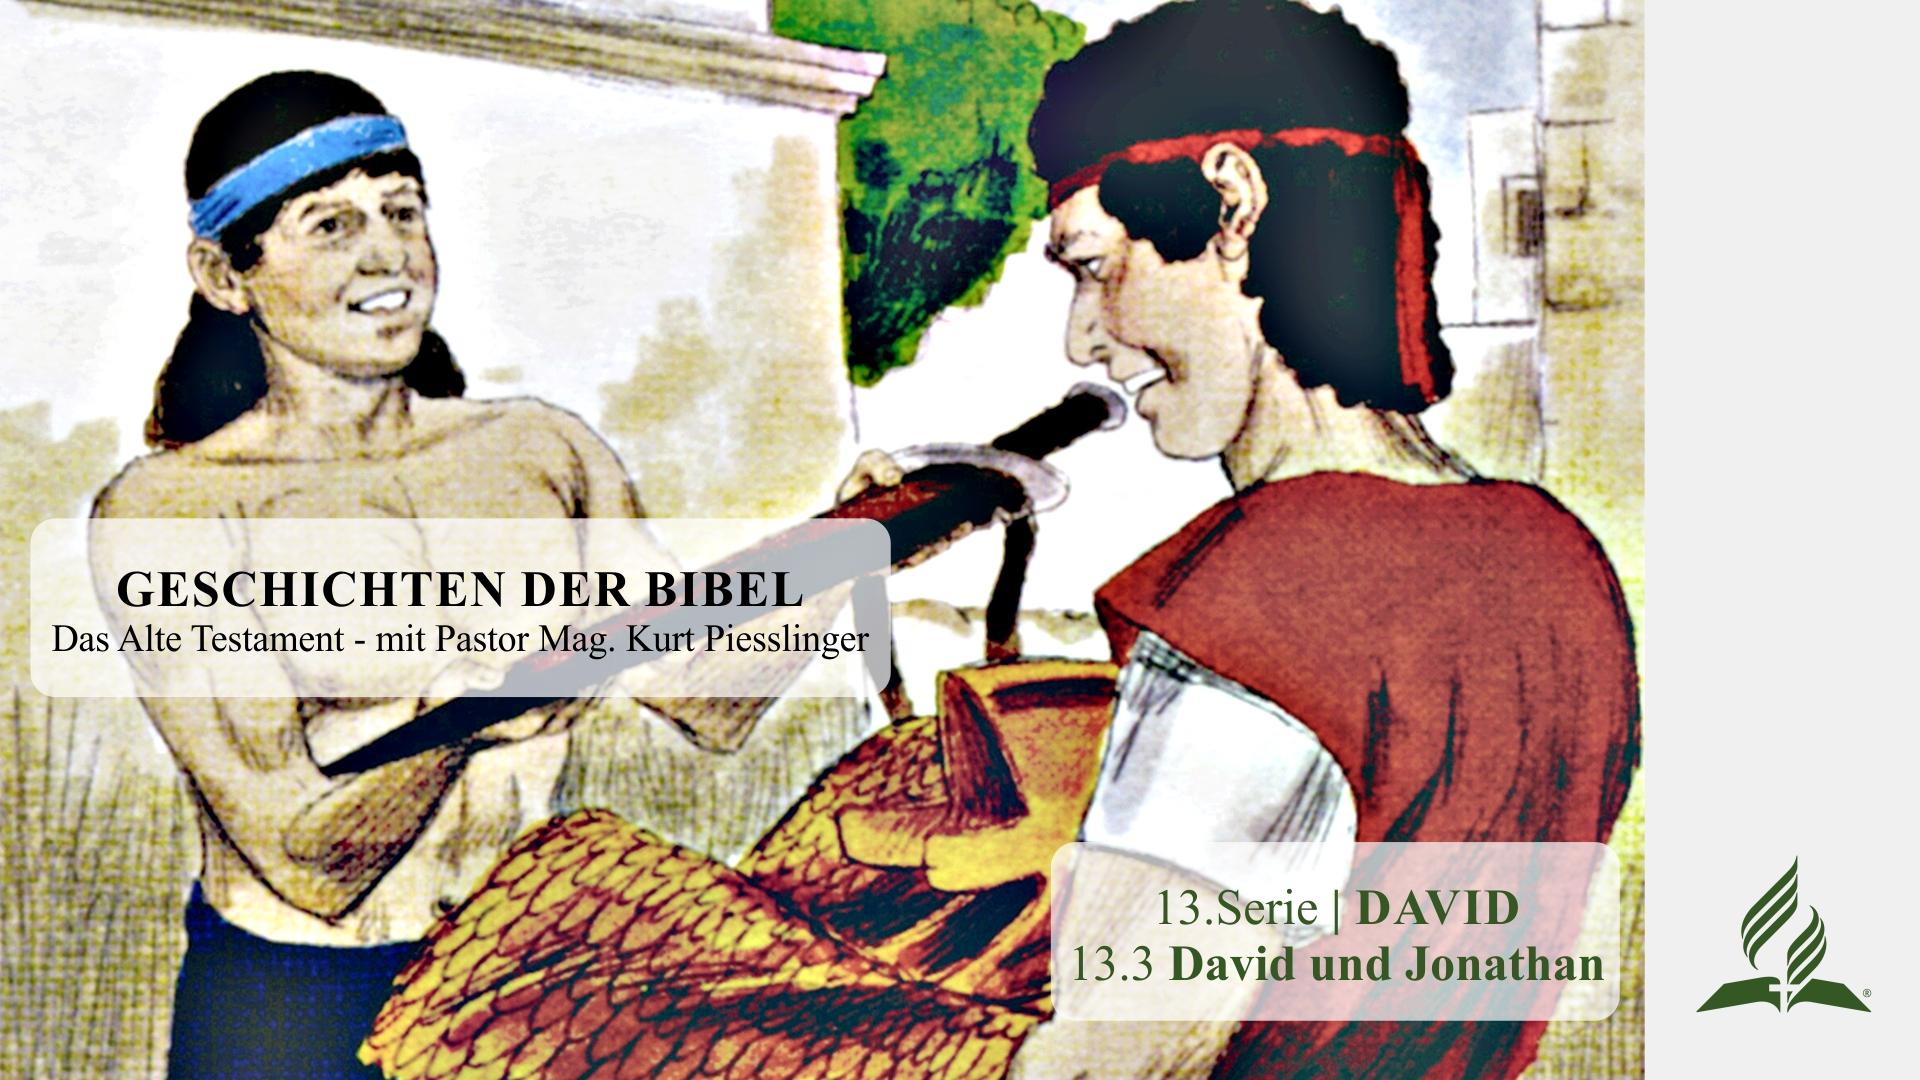 GESCHICHTEN DER BIBEL: 13.3 David und Jonathan – 13.DAVID | Pastor Mag. Kurt Piesslinger